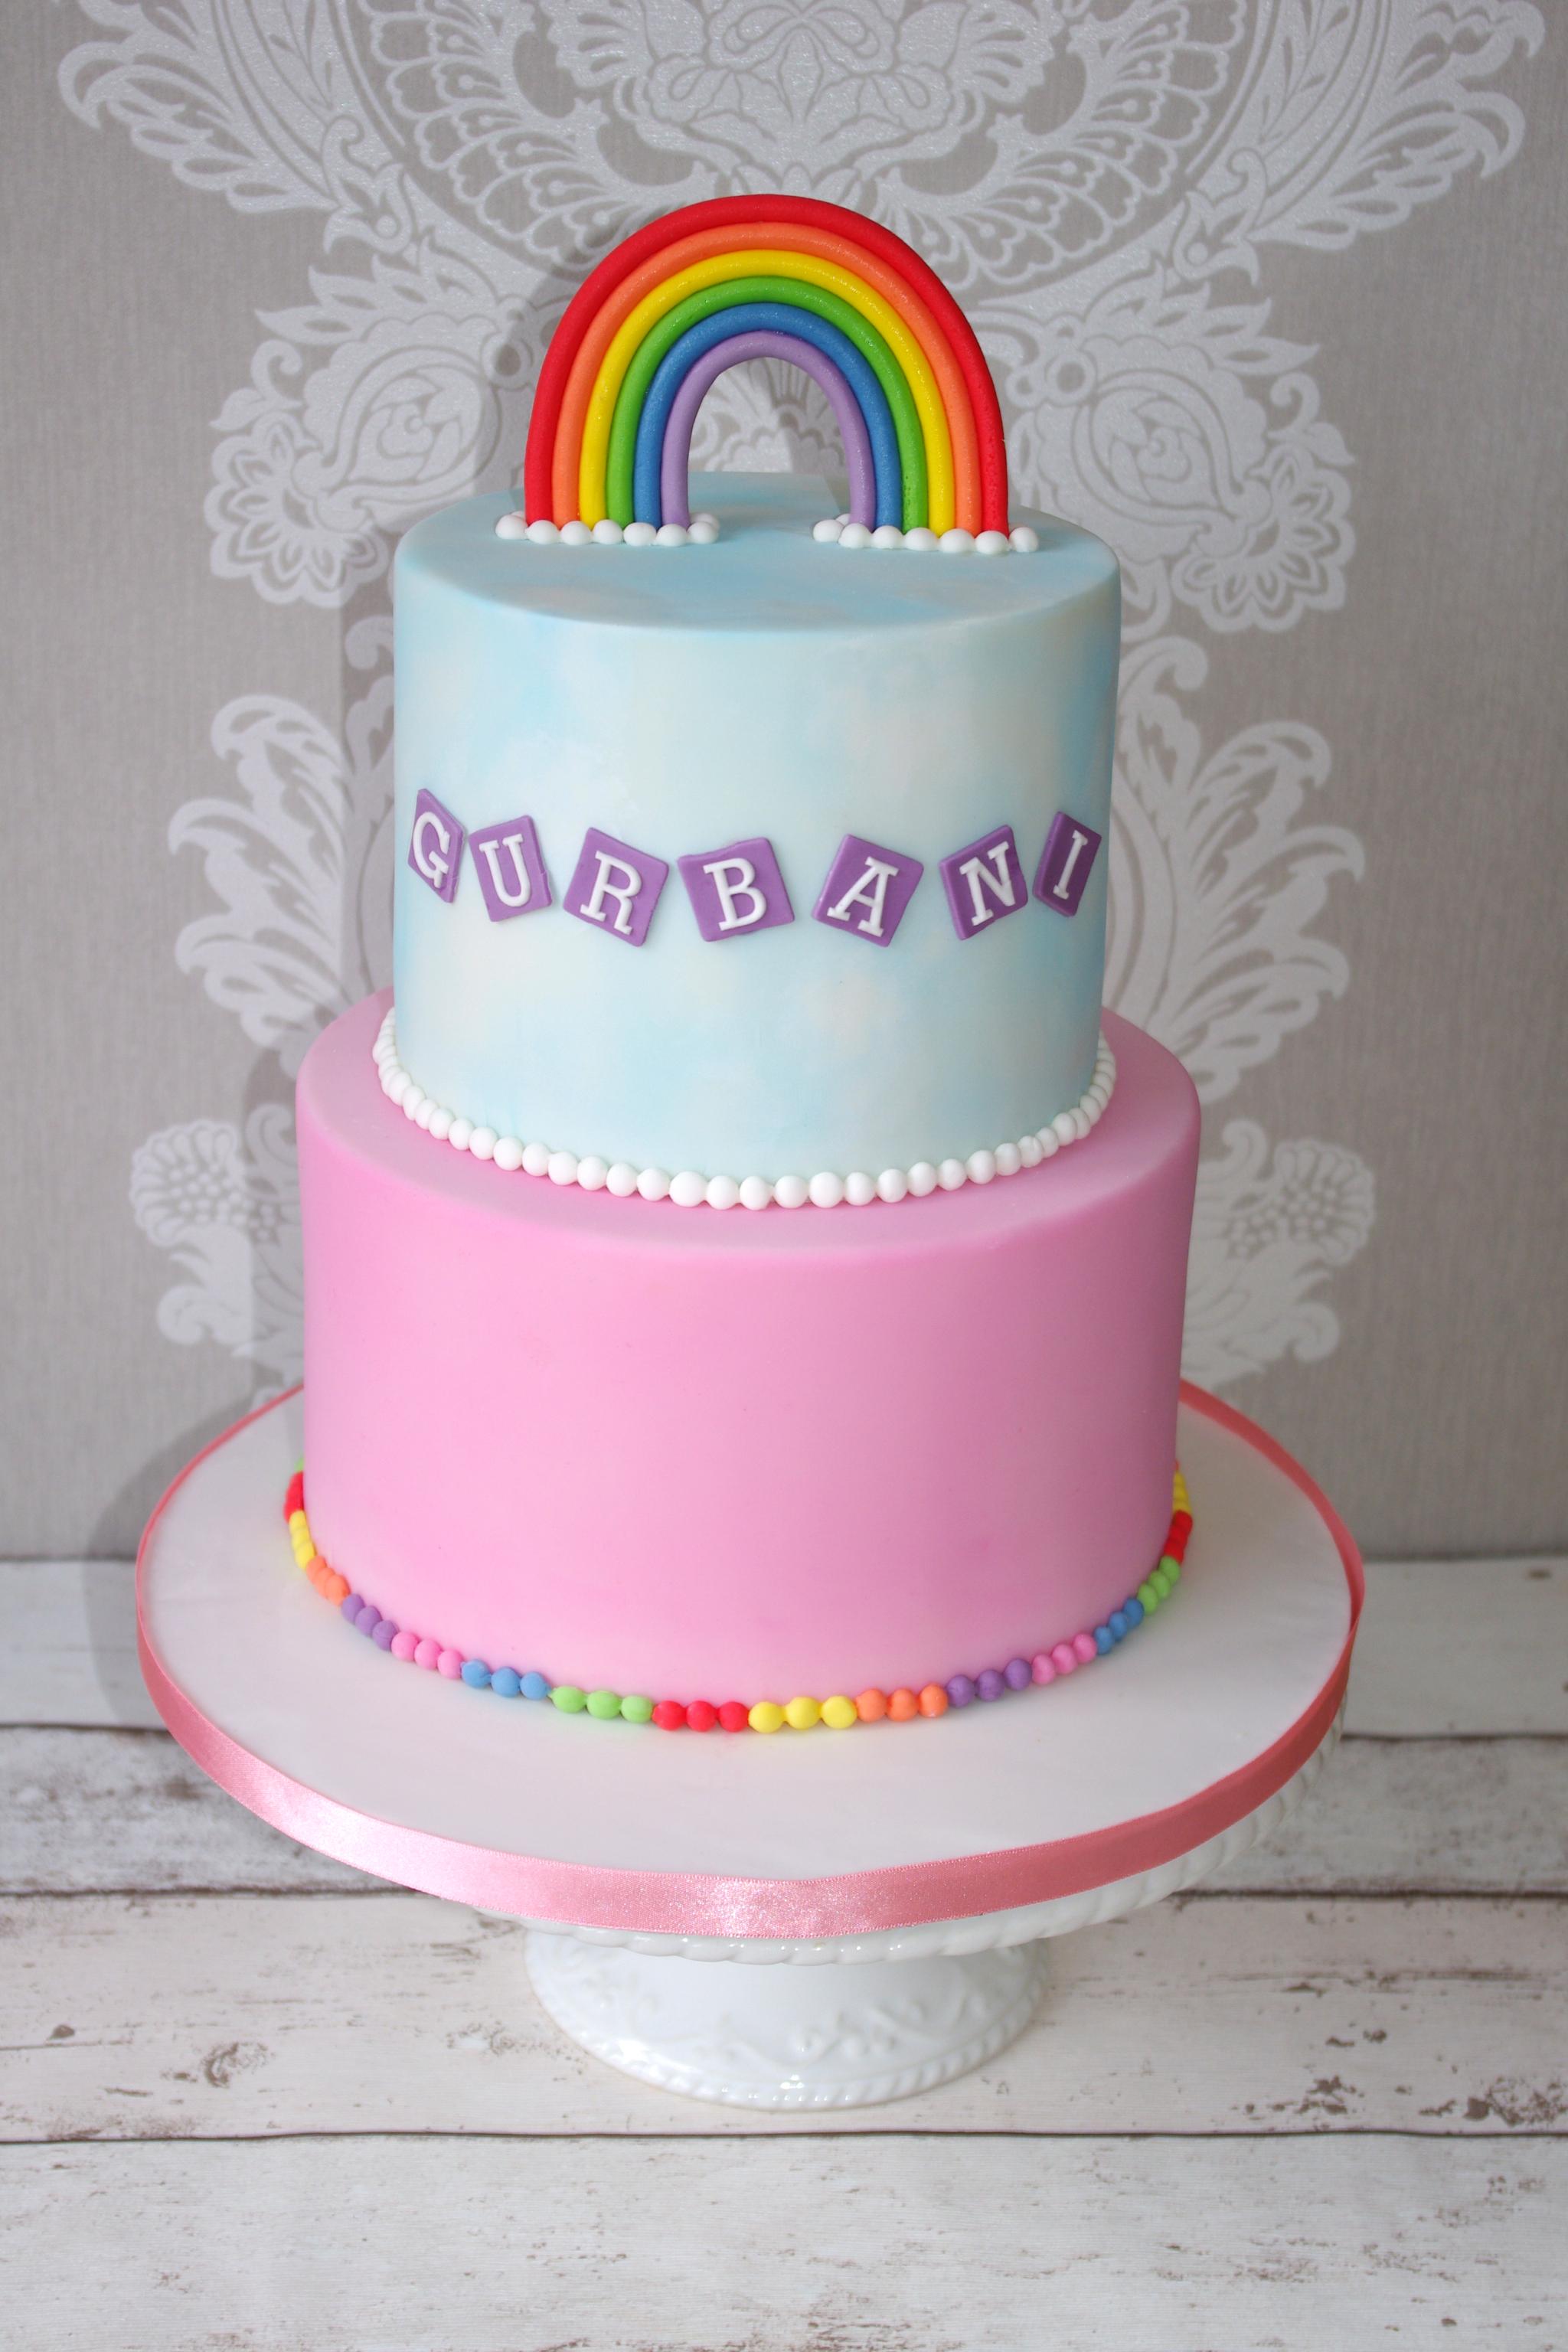 Rainbow and Sky cake